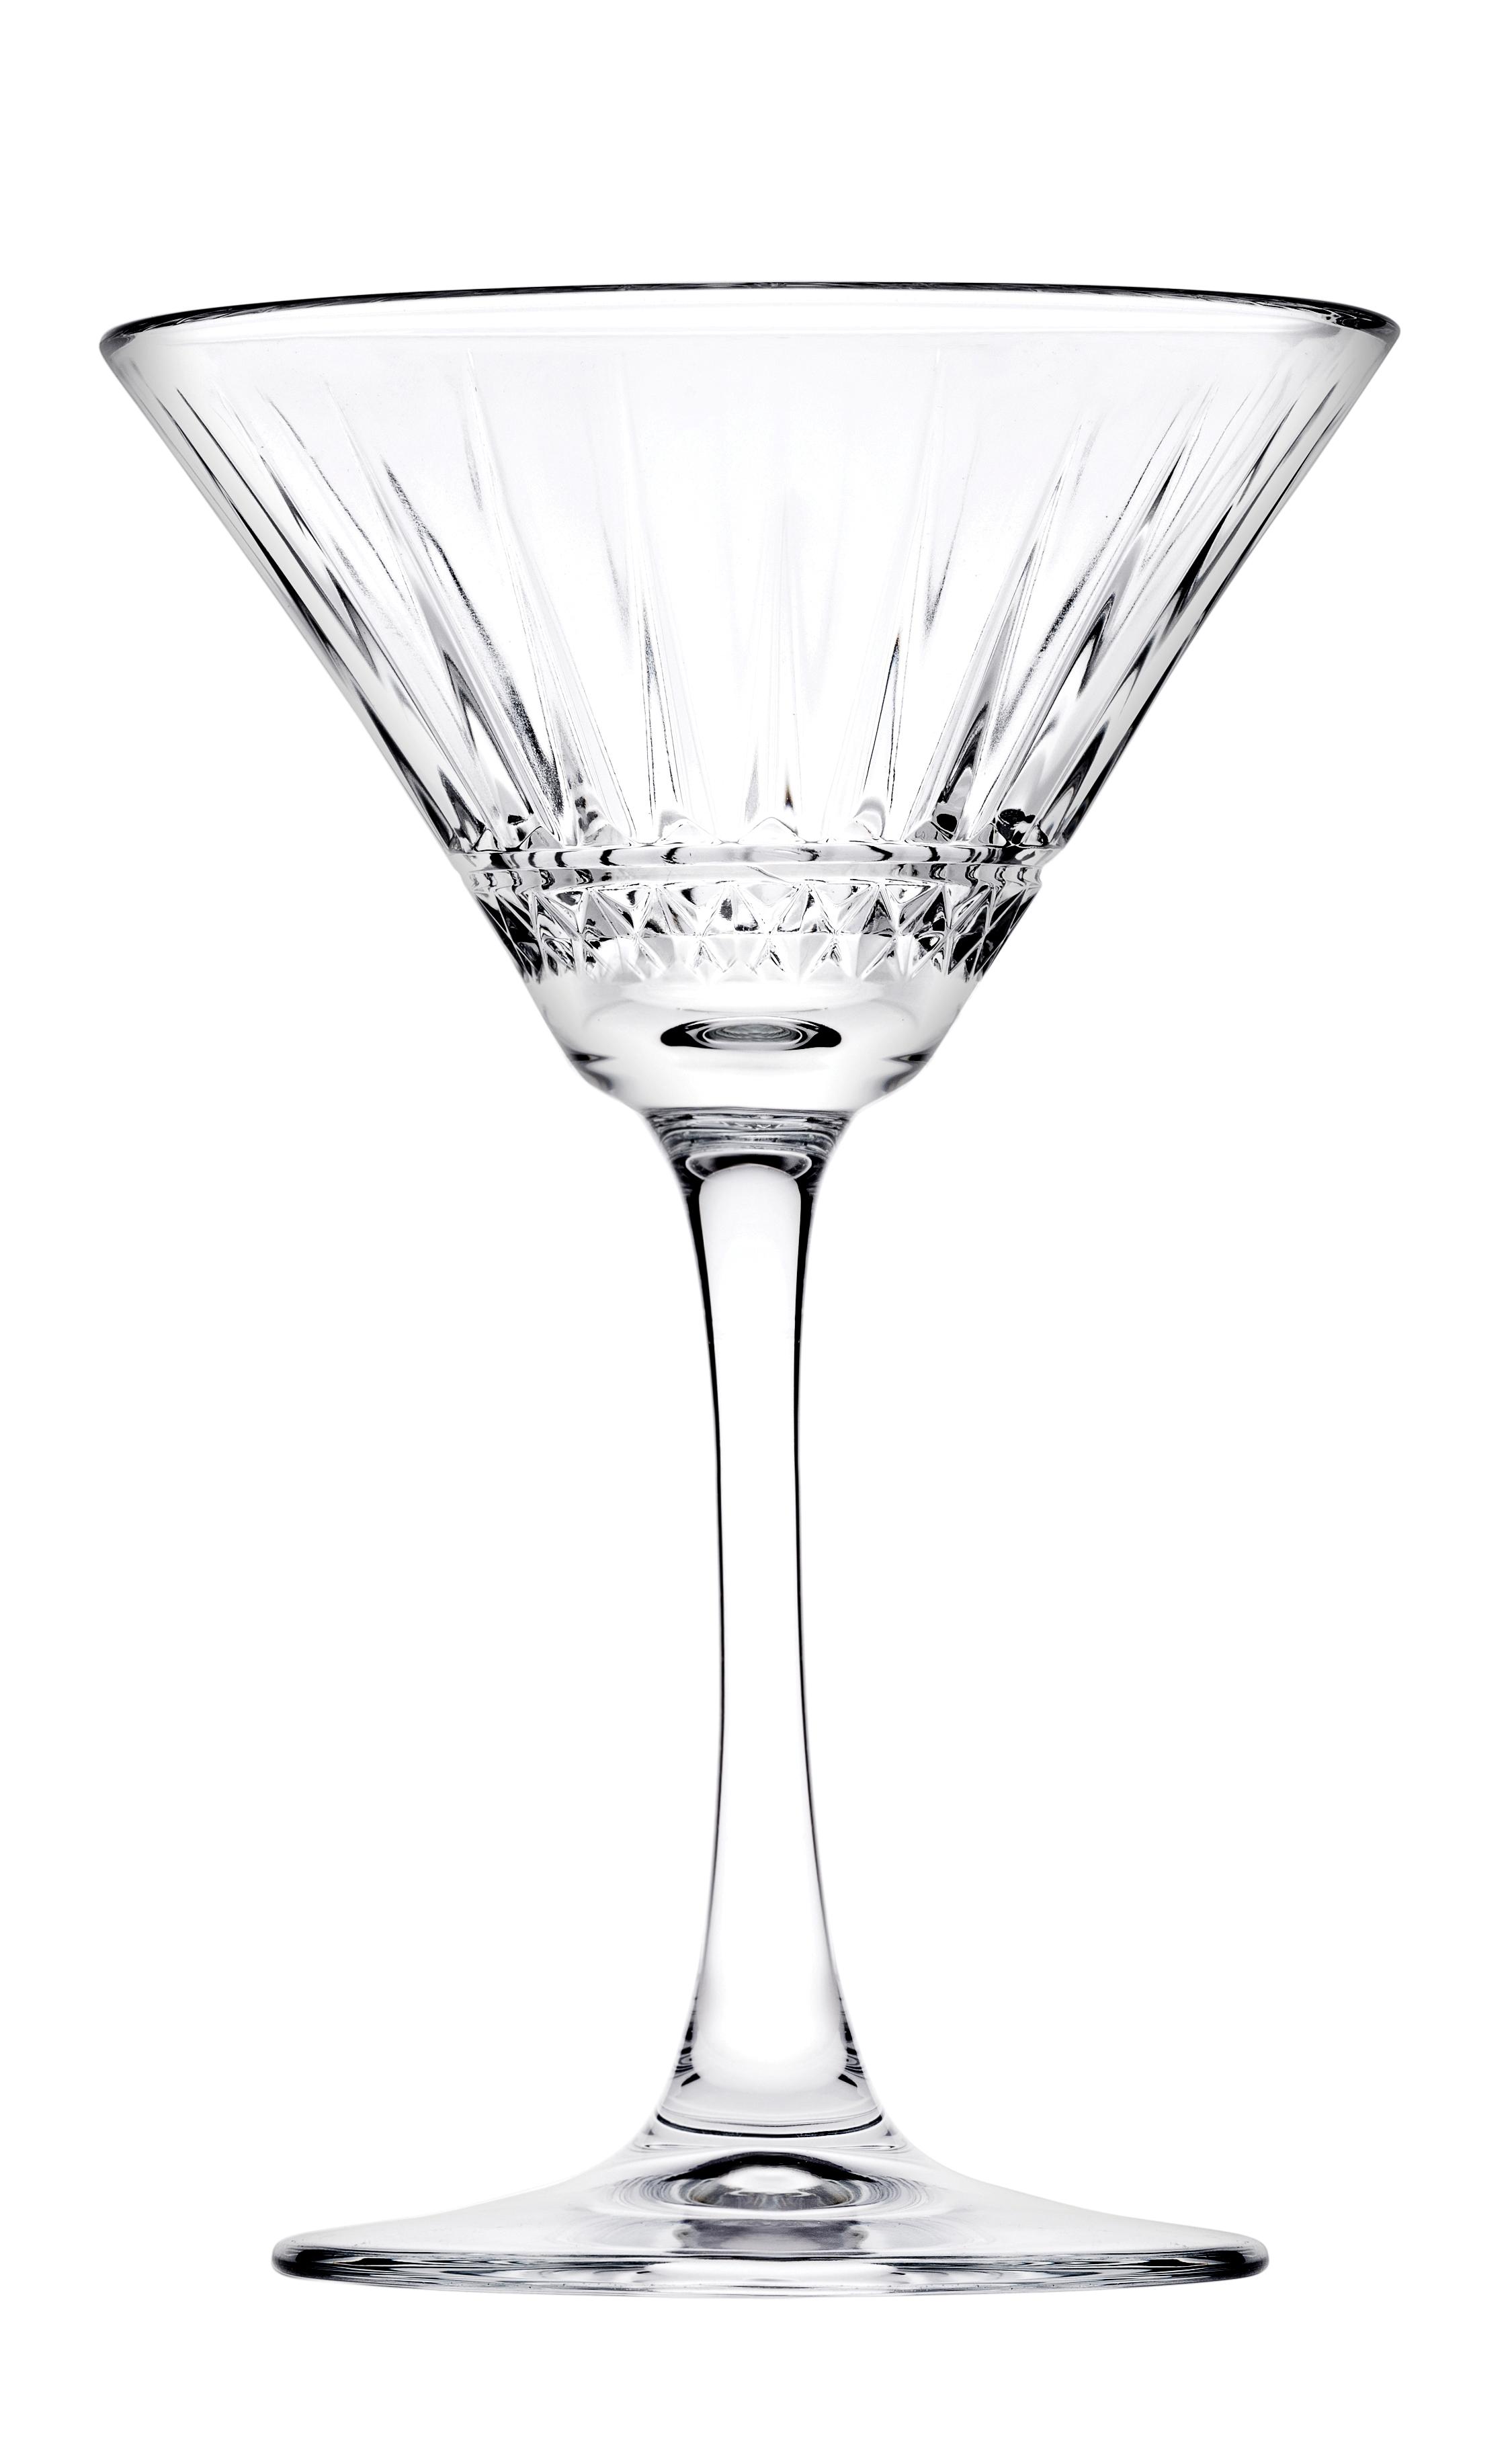 Elysia kozarec grt 4/1 martini 22cl